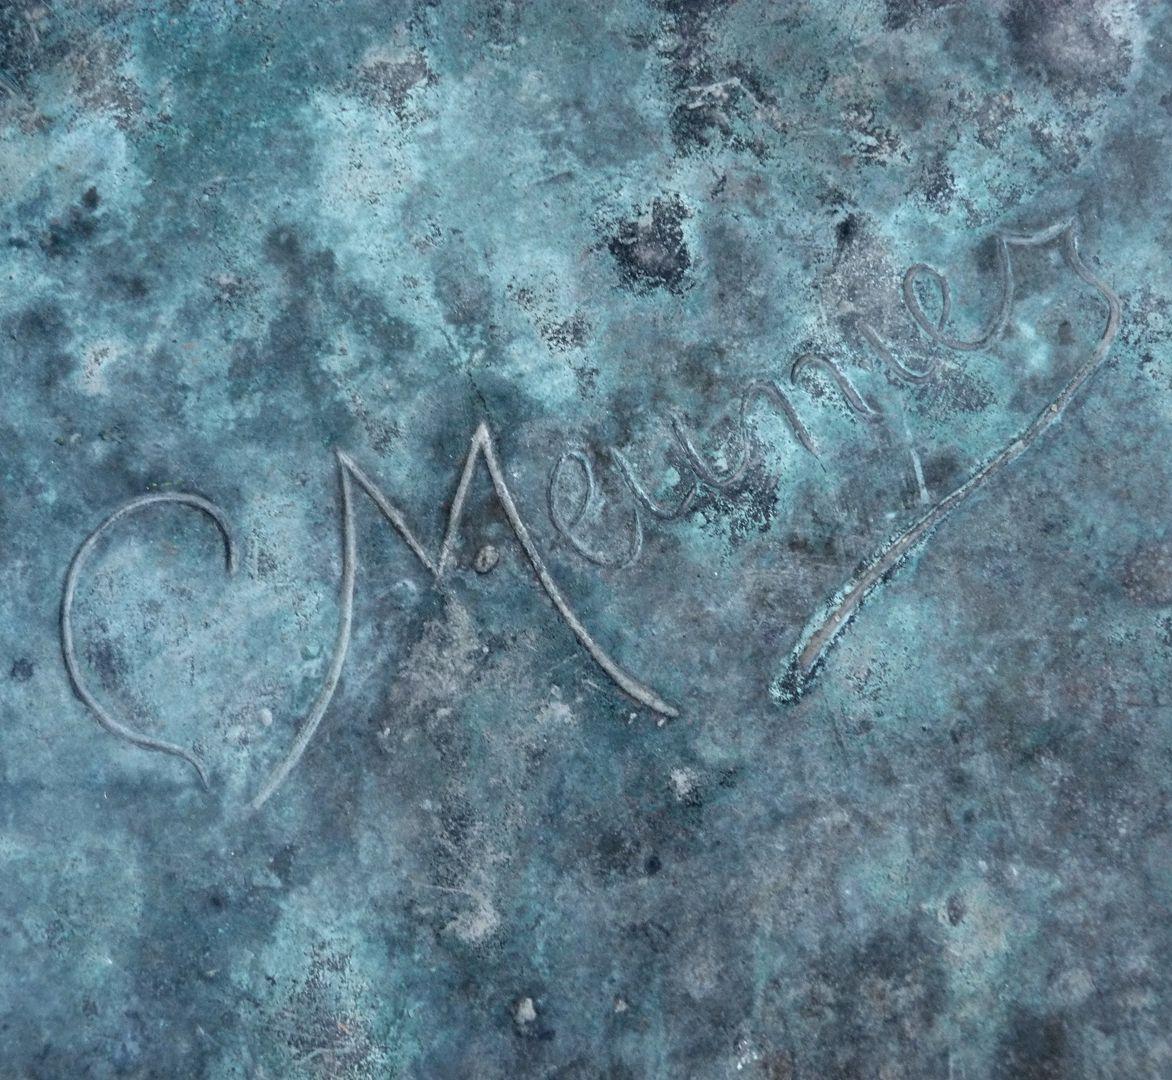 Master smith Artist´s signature on the pedestal